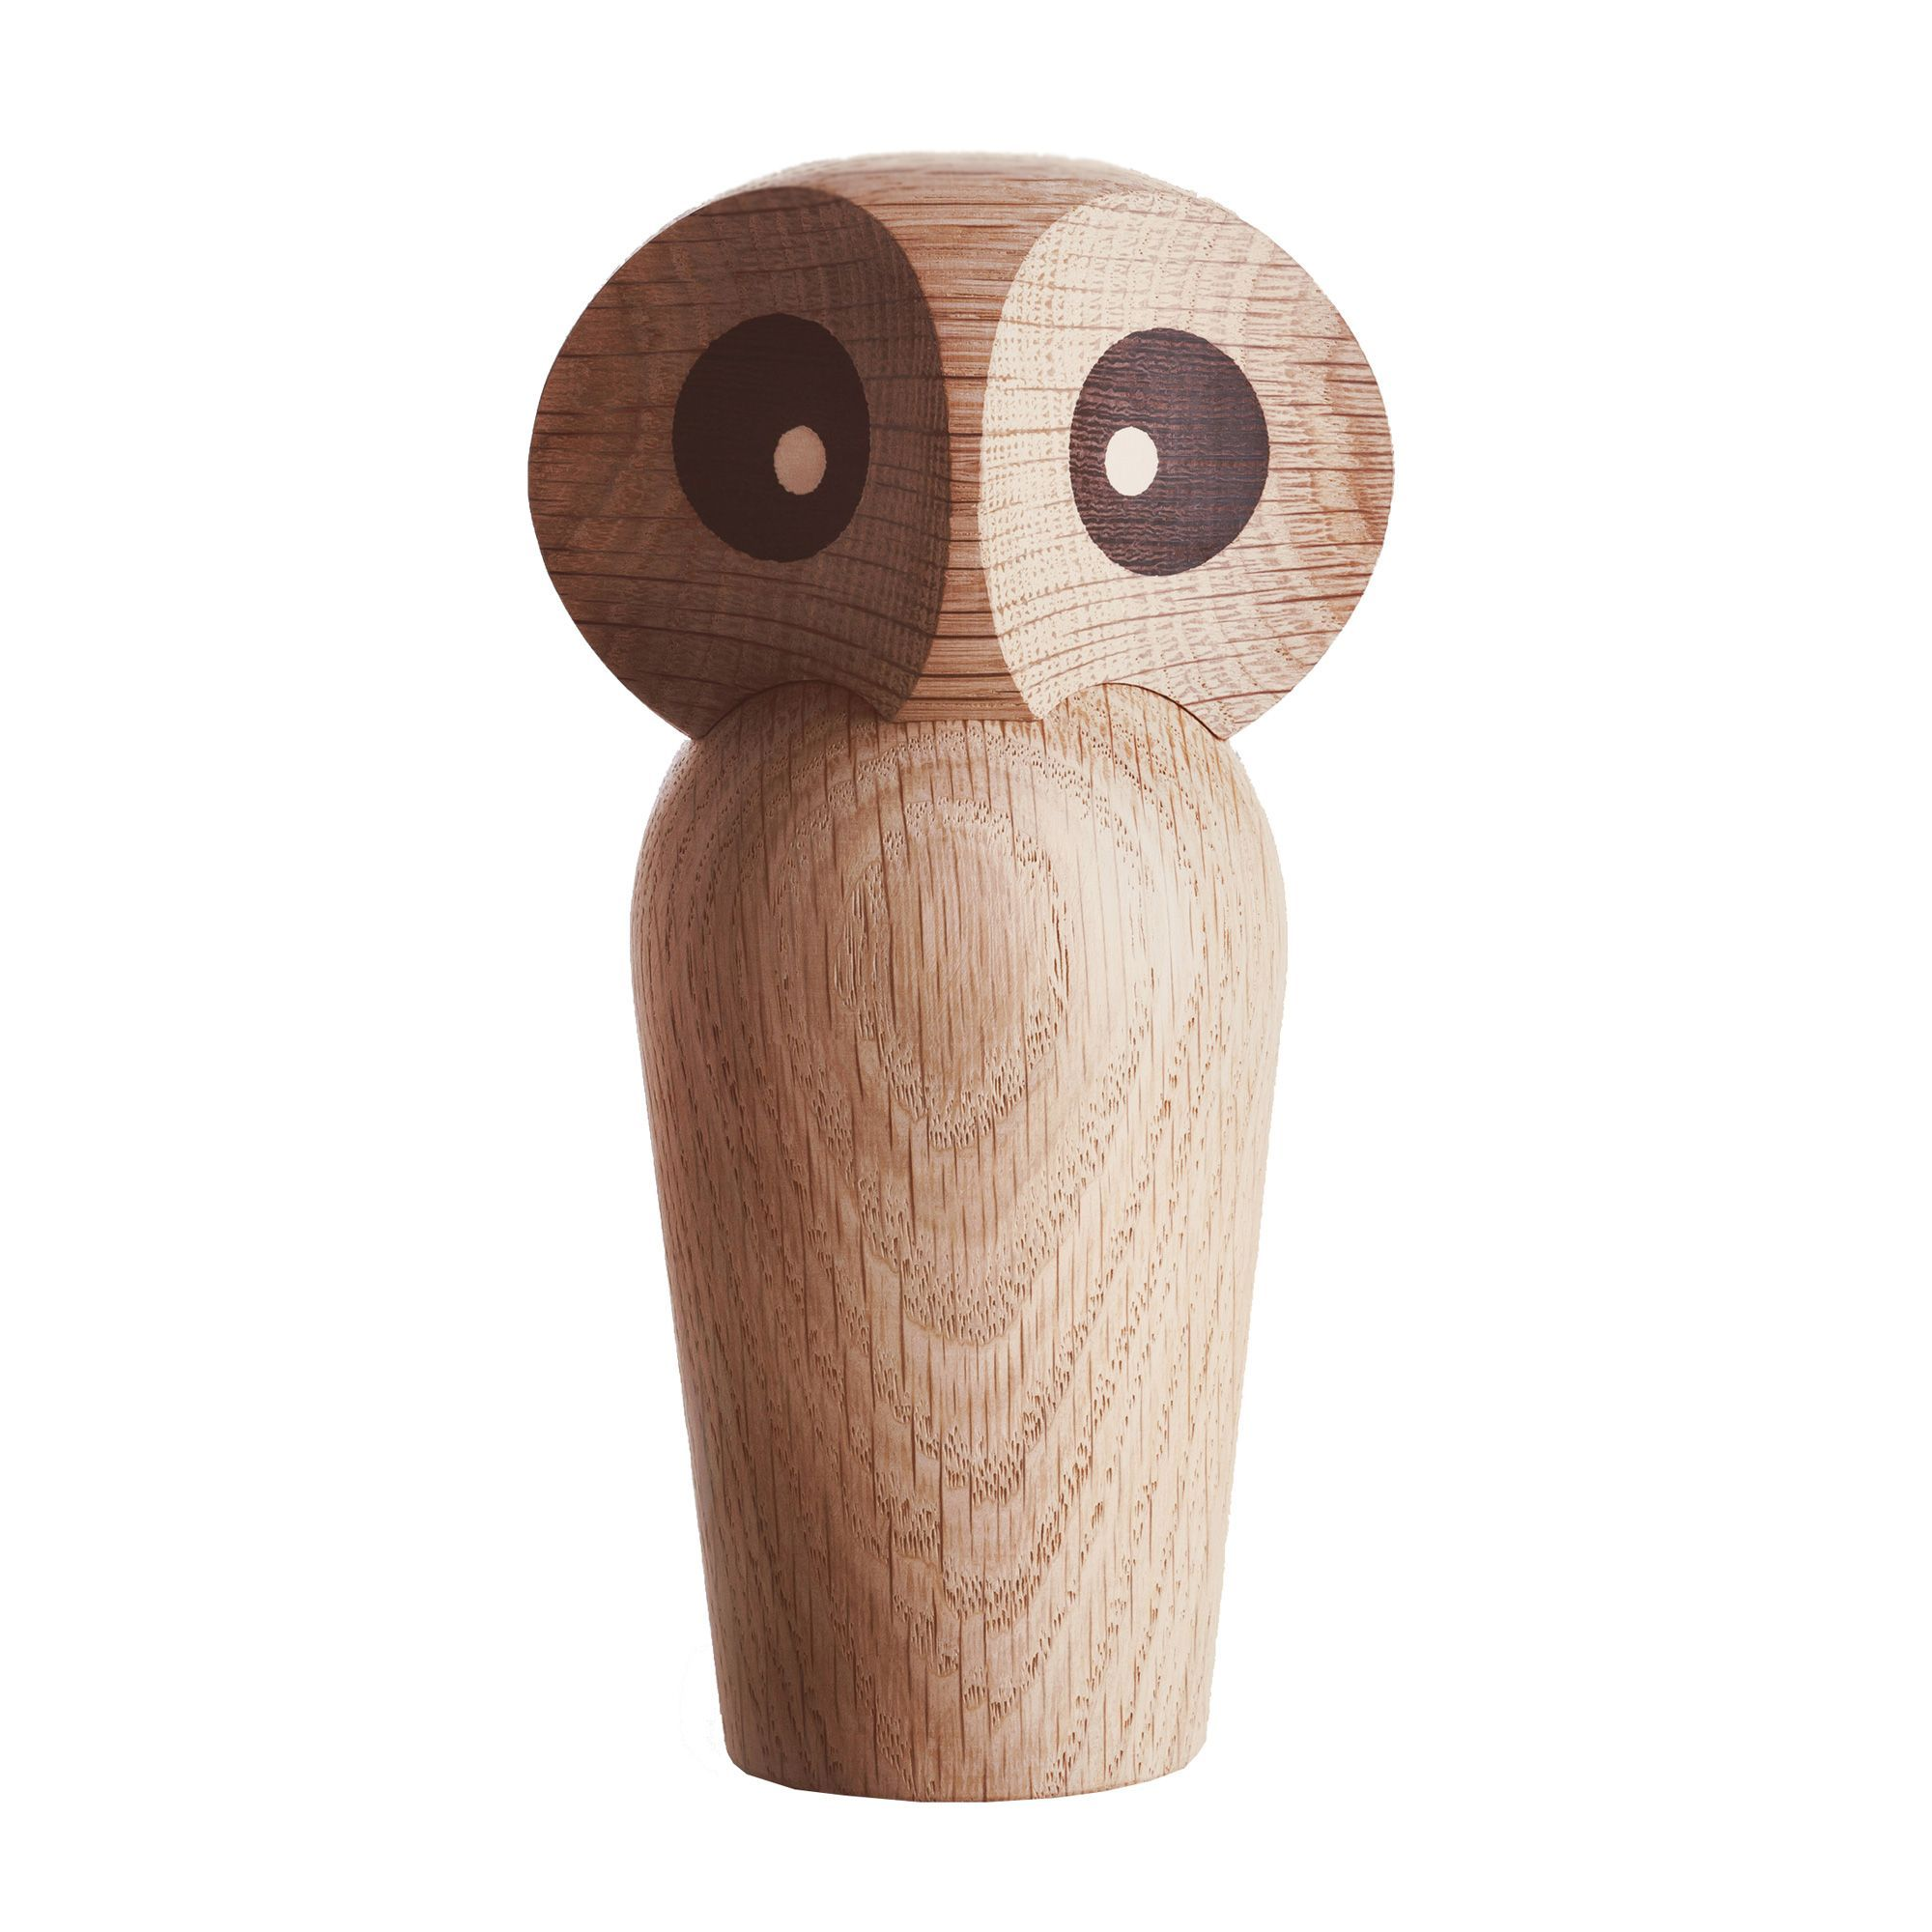 ArchitectMade Owl woondecoratie small